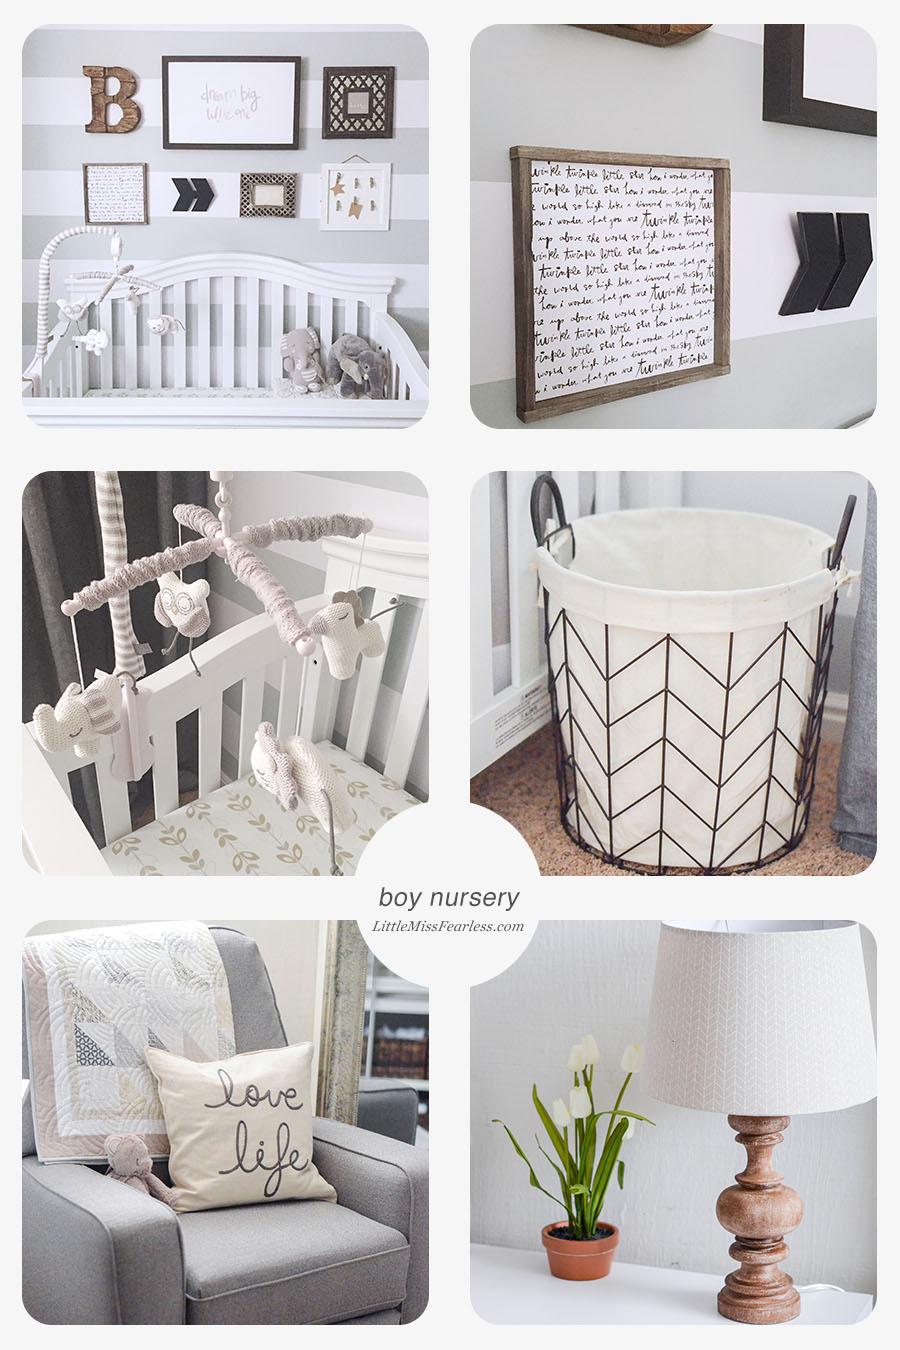 LittleMissFearless_baby-boy-nursery-1